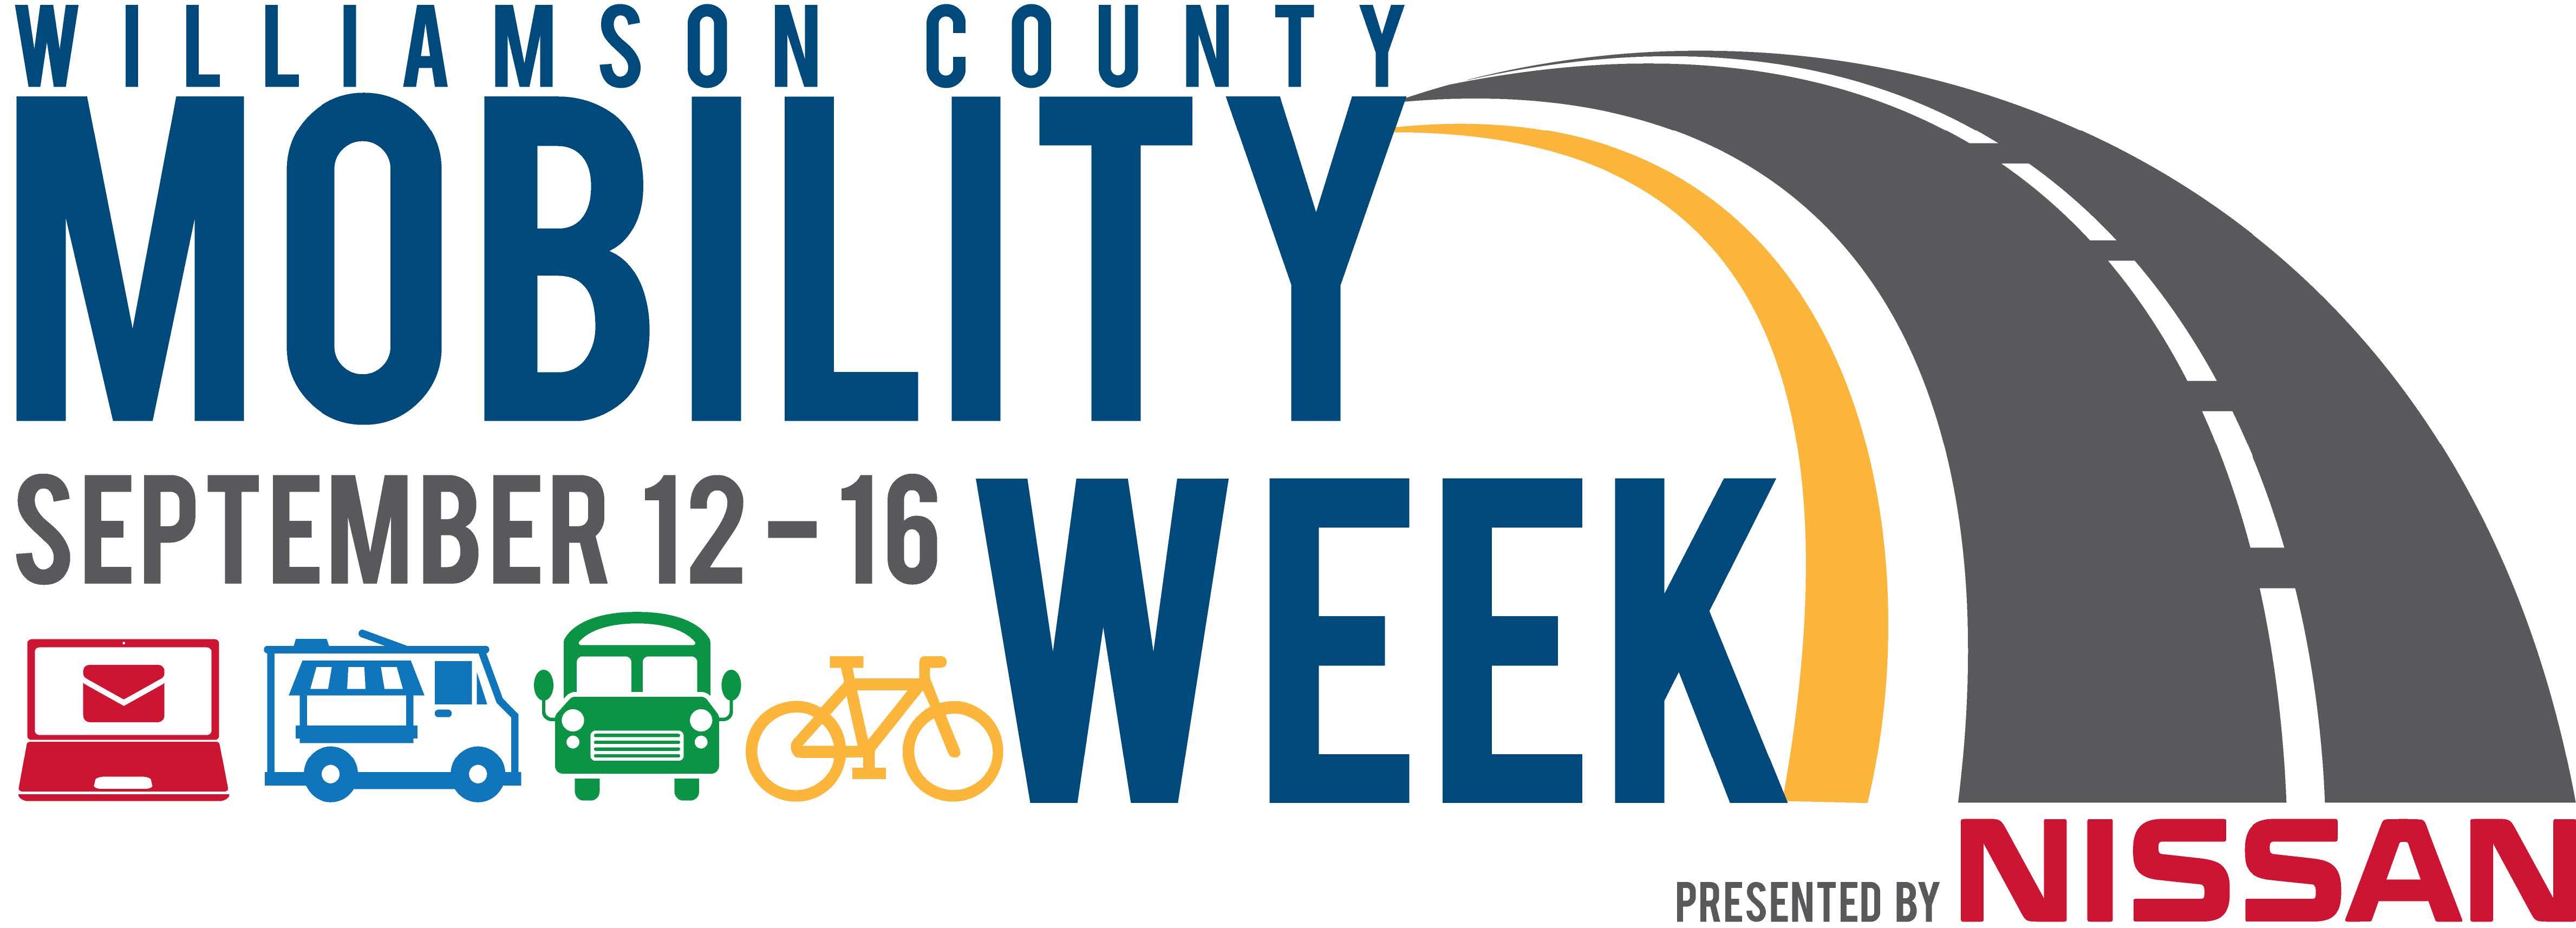 Mobility Week logo